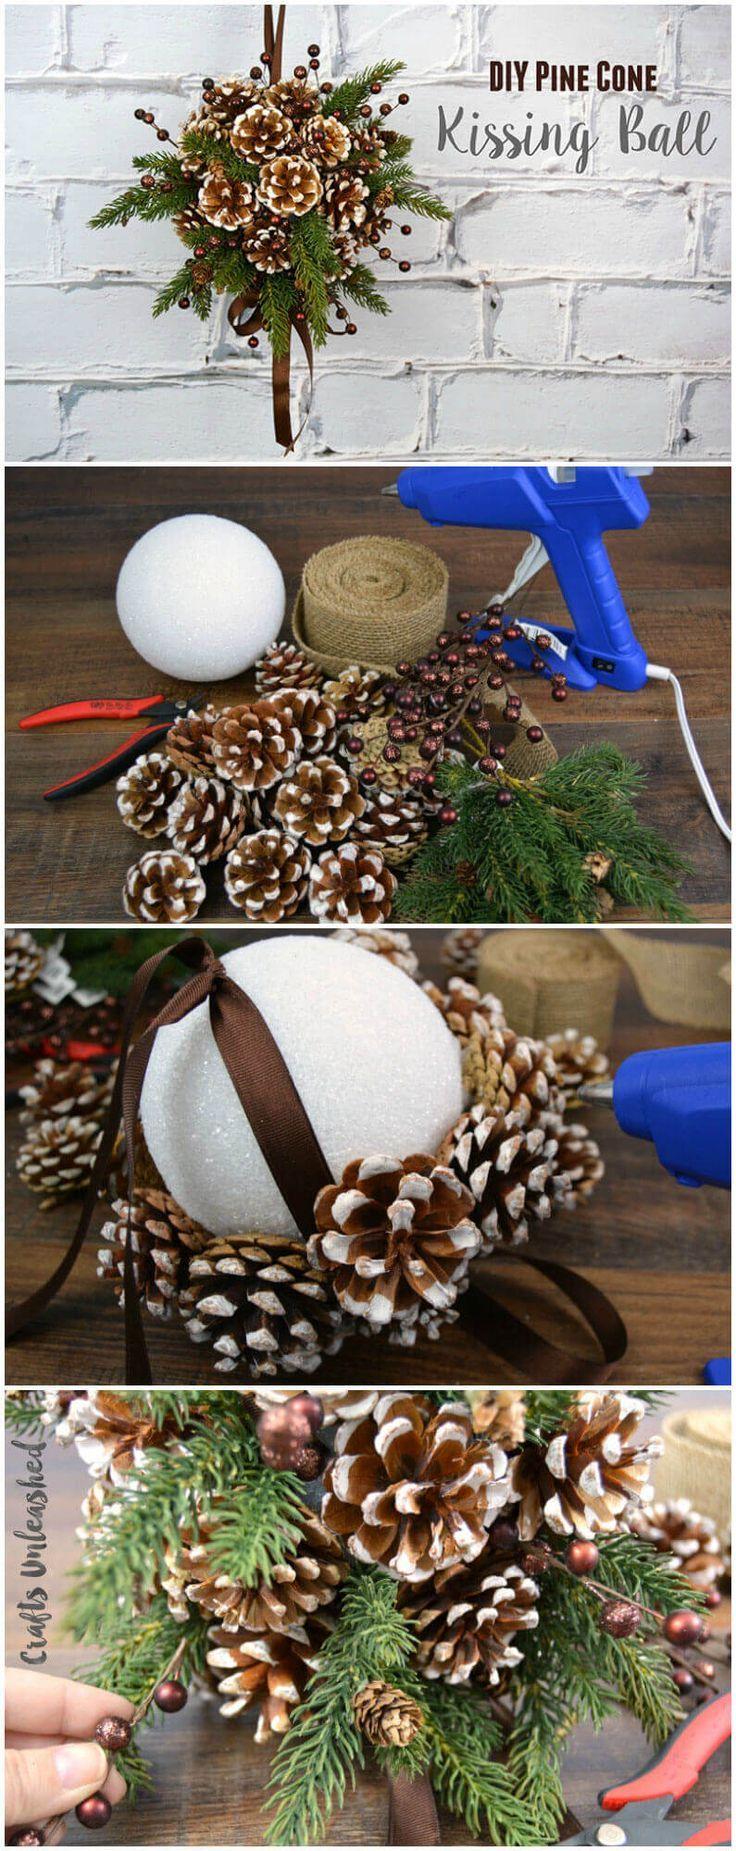 25 Beautiful DIY Pine Cone Crafts to